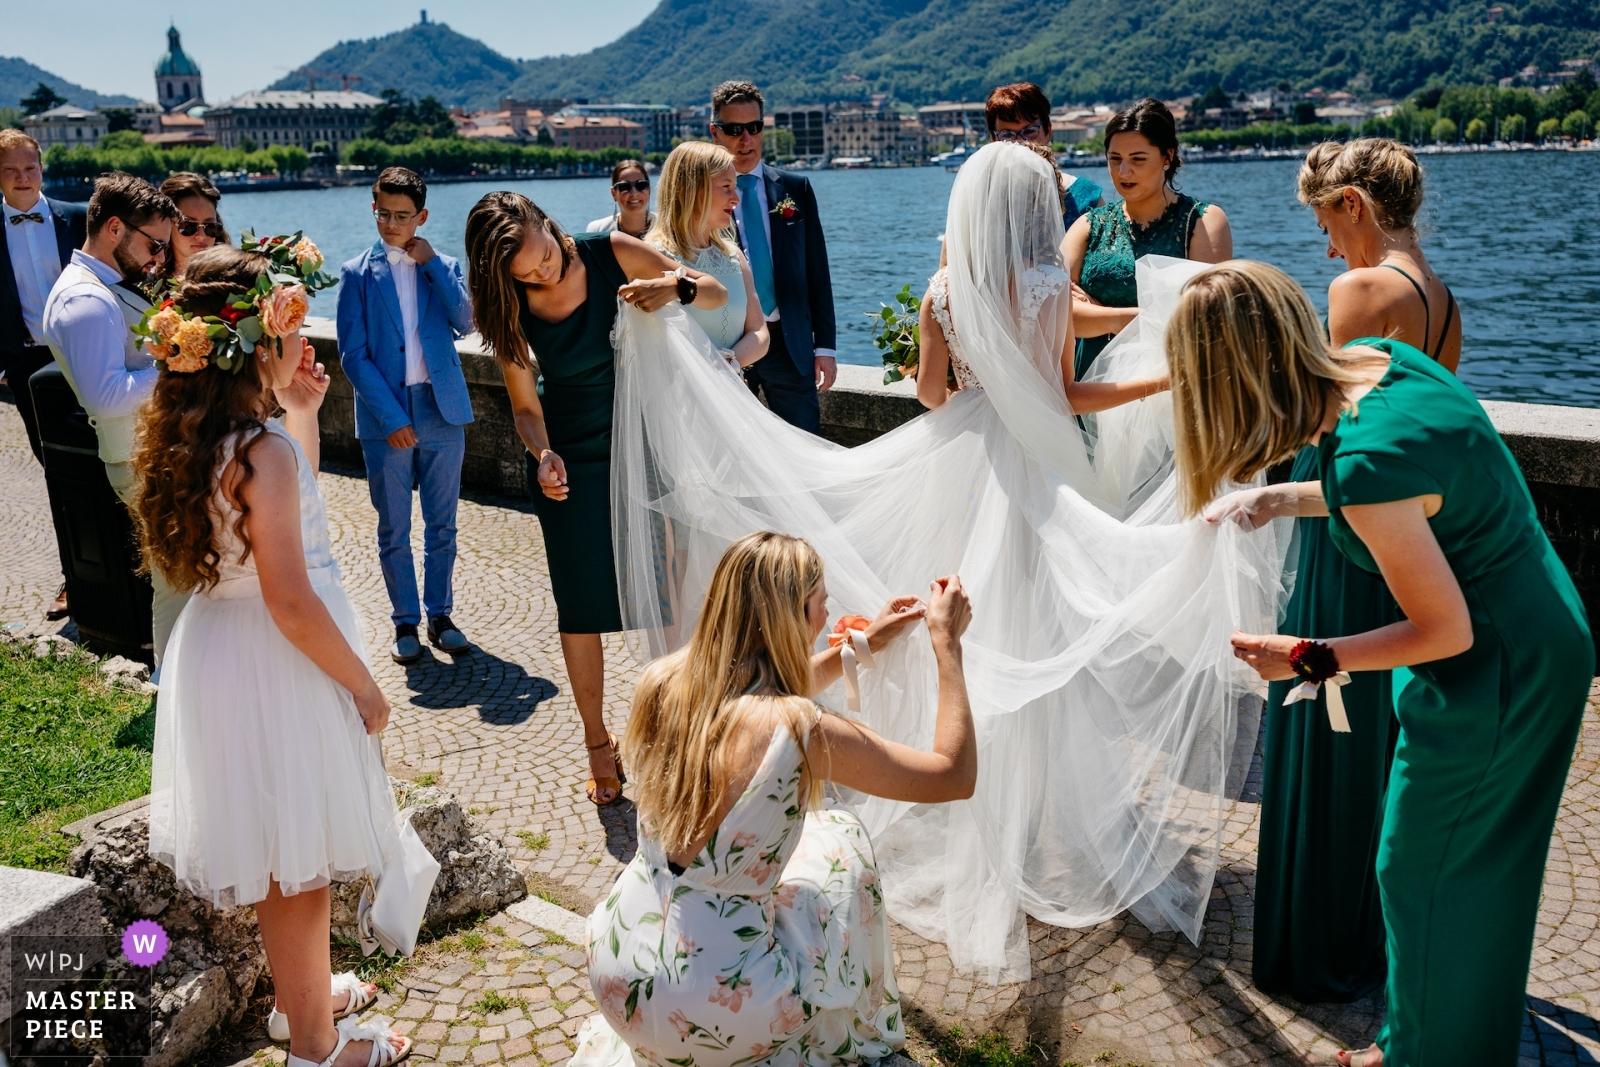 bride with friends  - Utrecht, Netherlands Wedding Photography -  | wedding venue